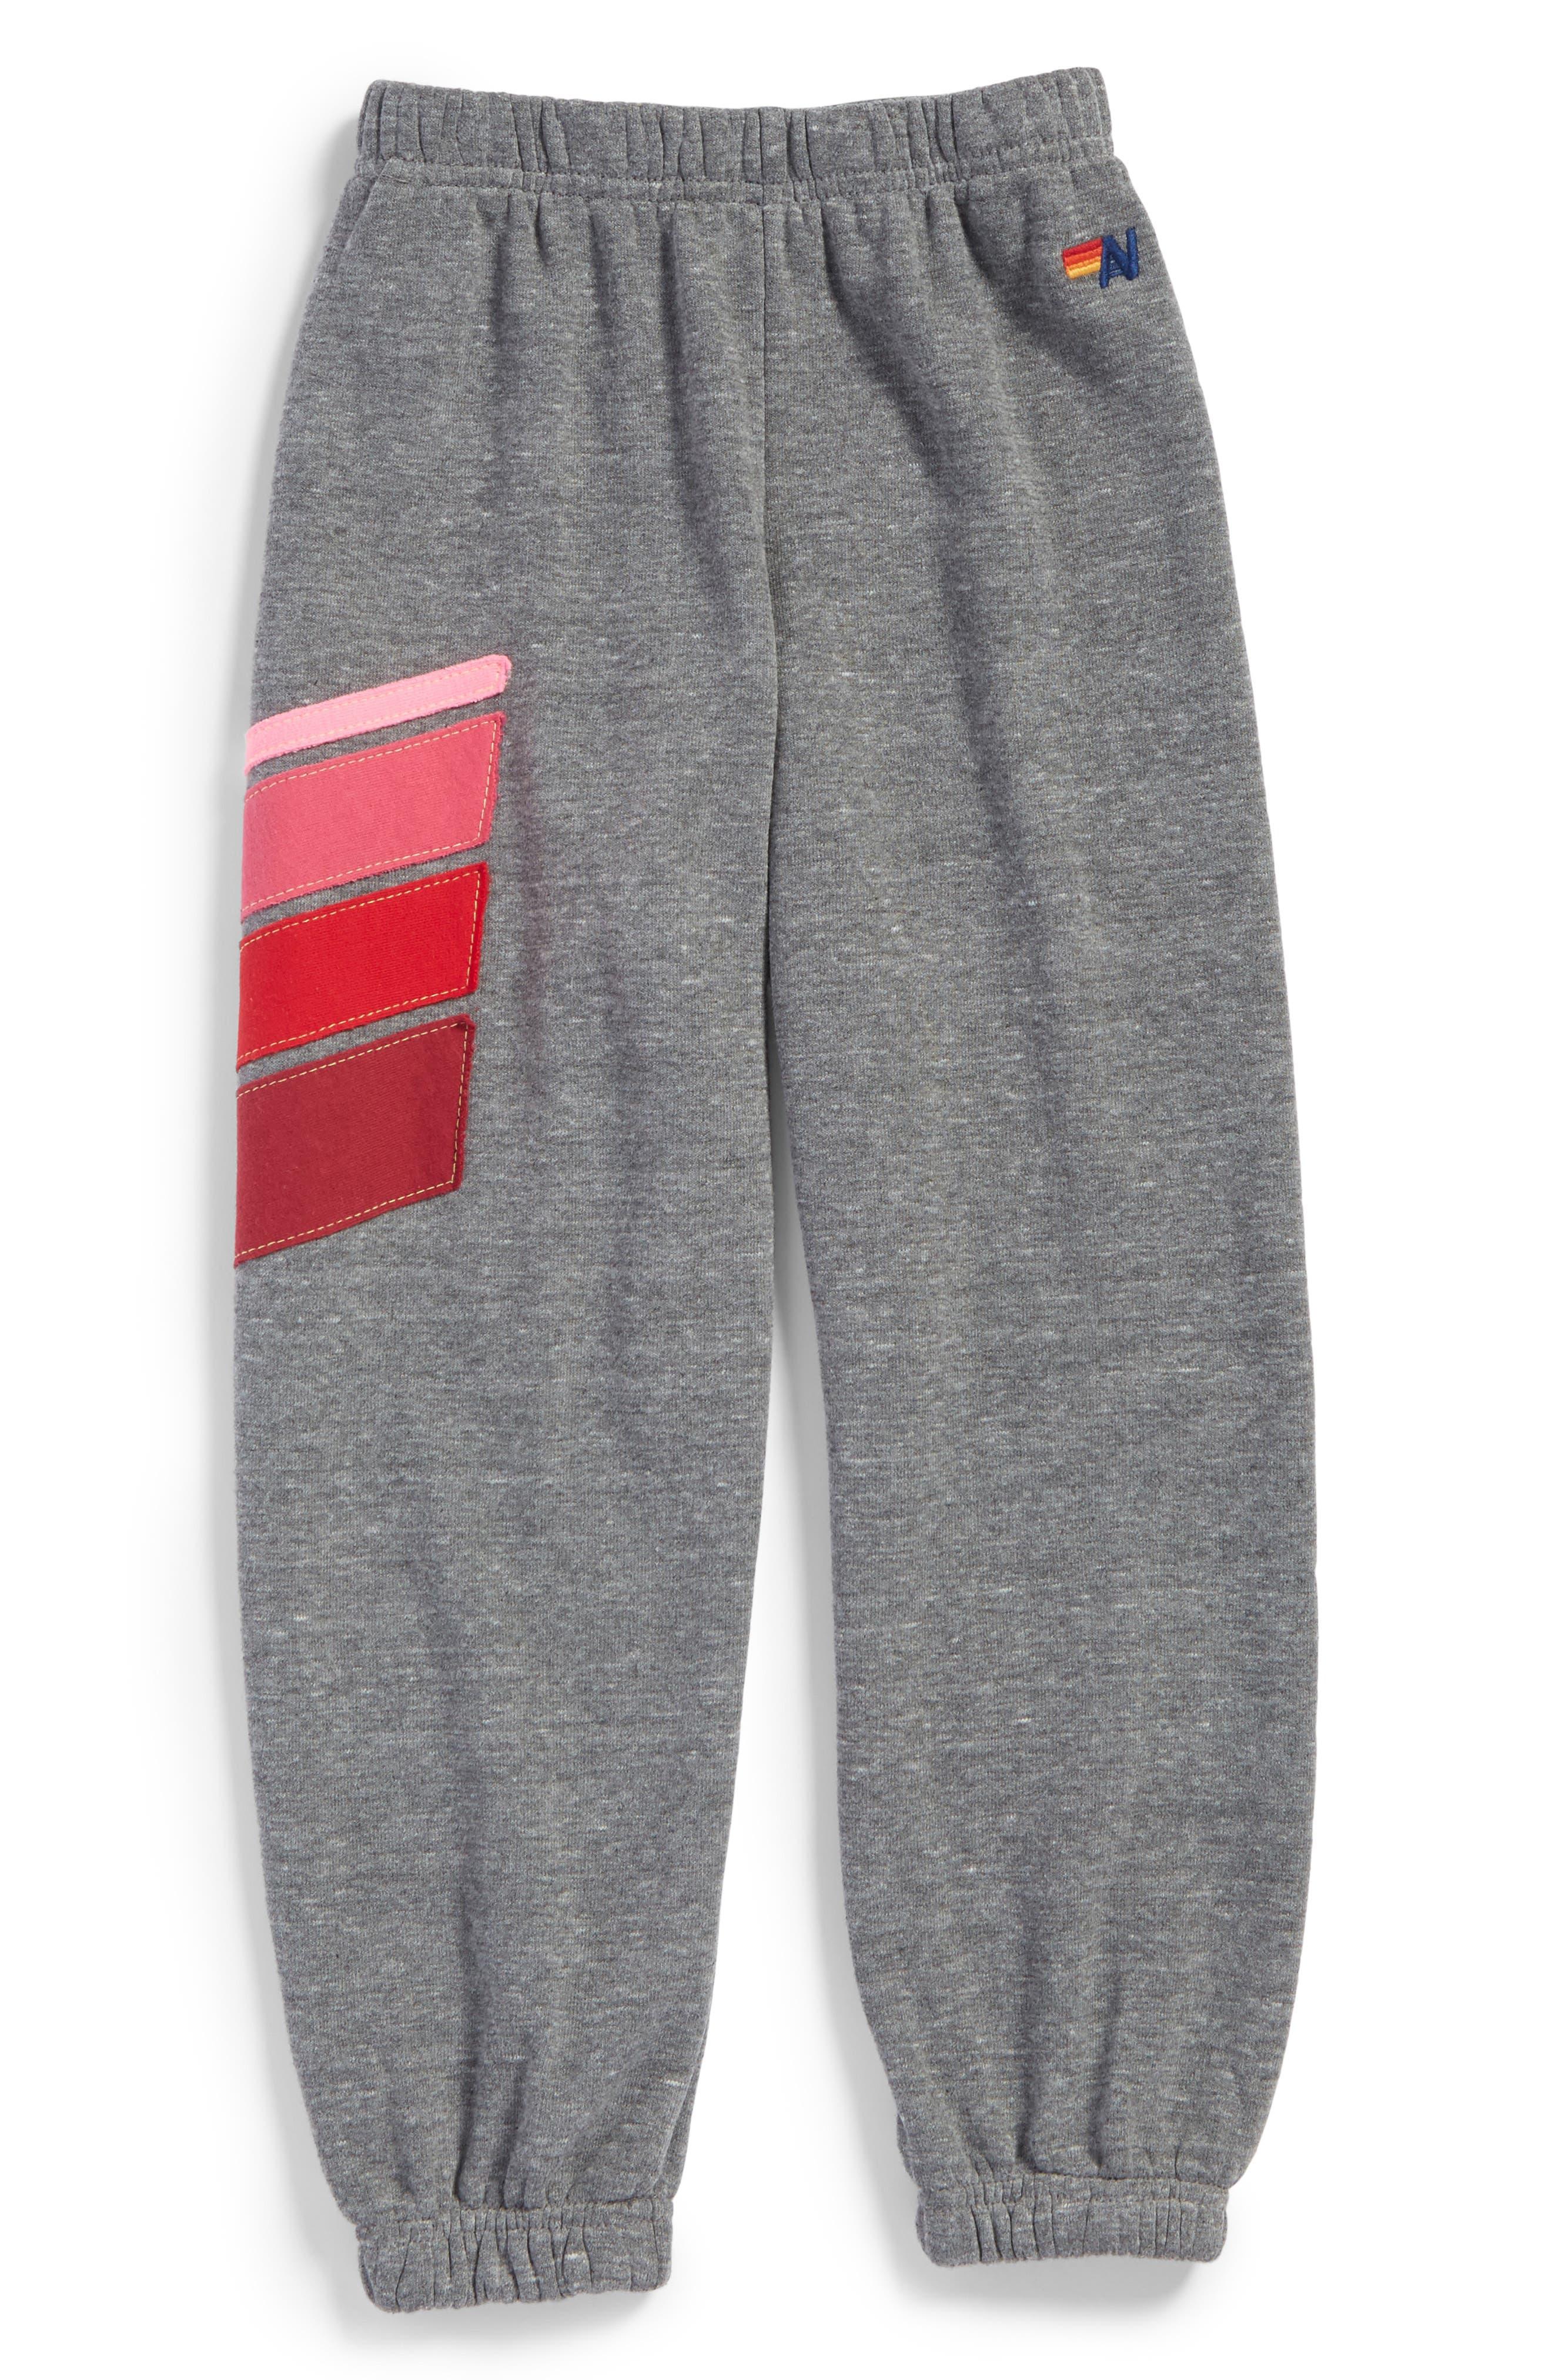 Sport Sweatpants,                             Main thumbnail 1, color,                             Heather Grey/ Pink